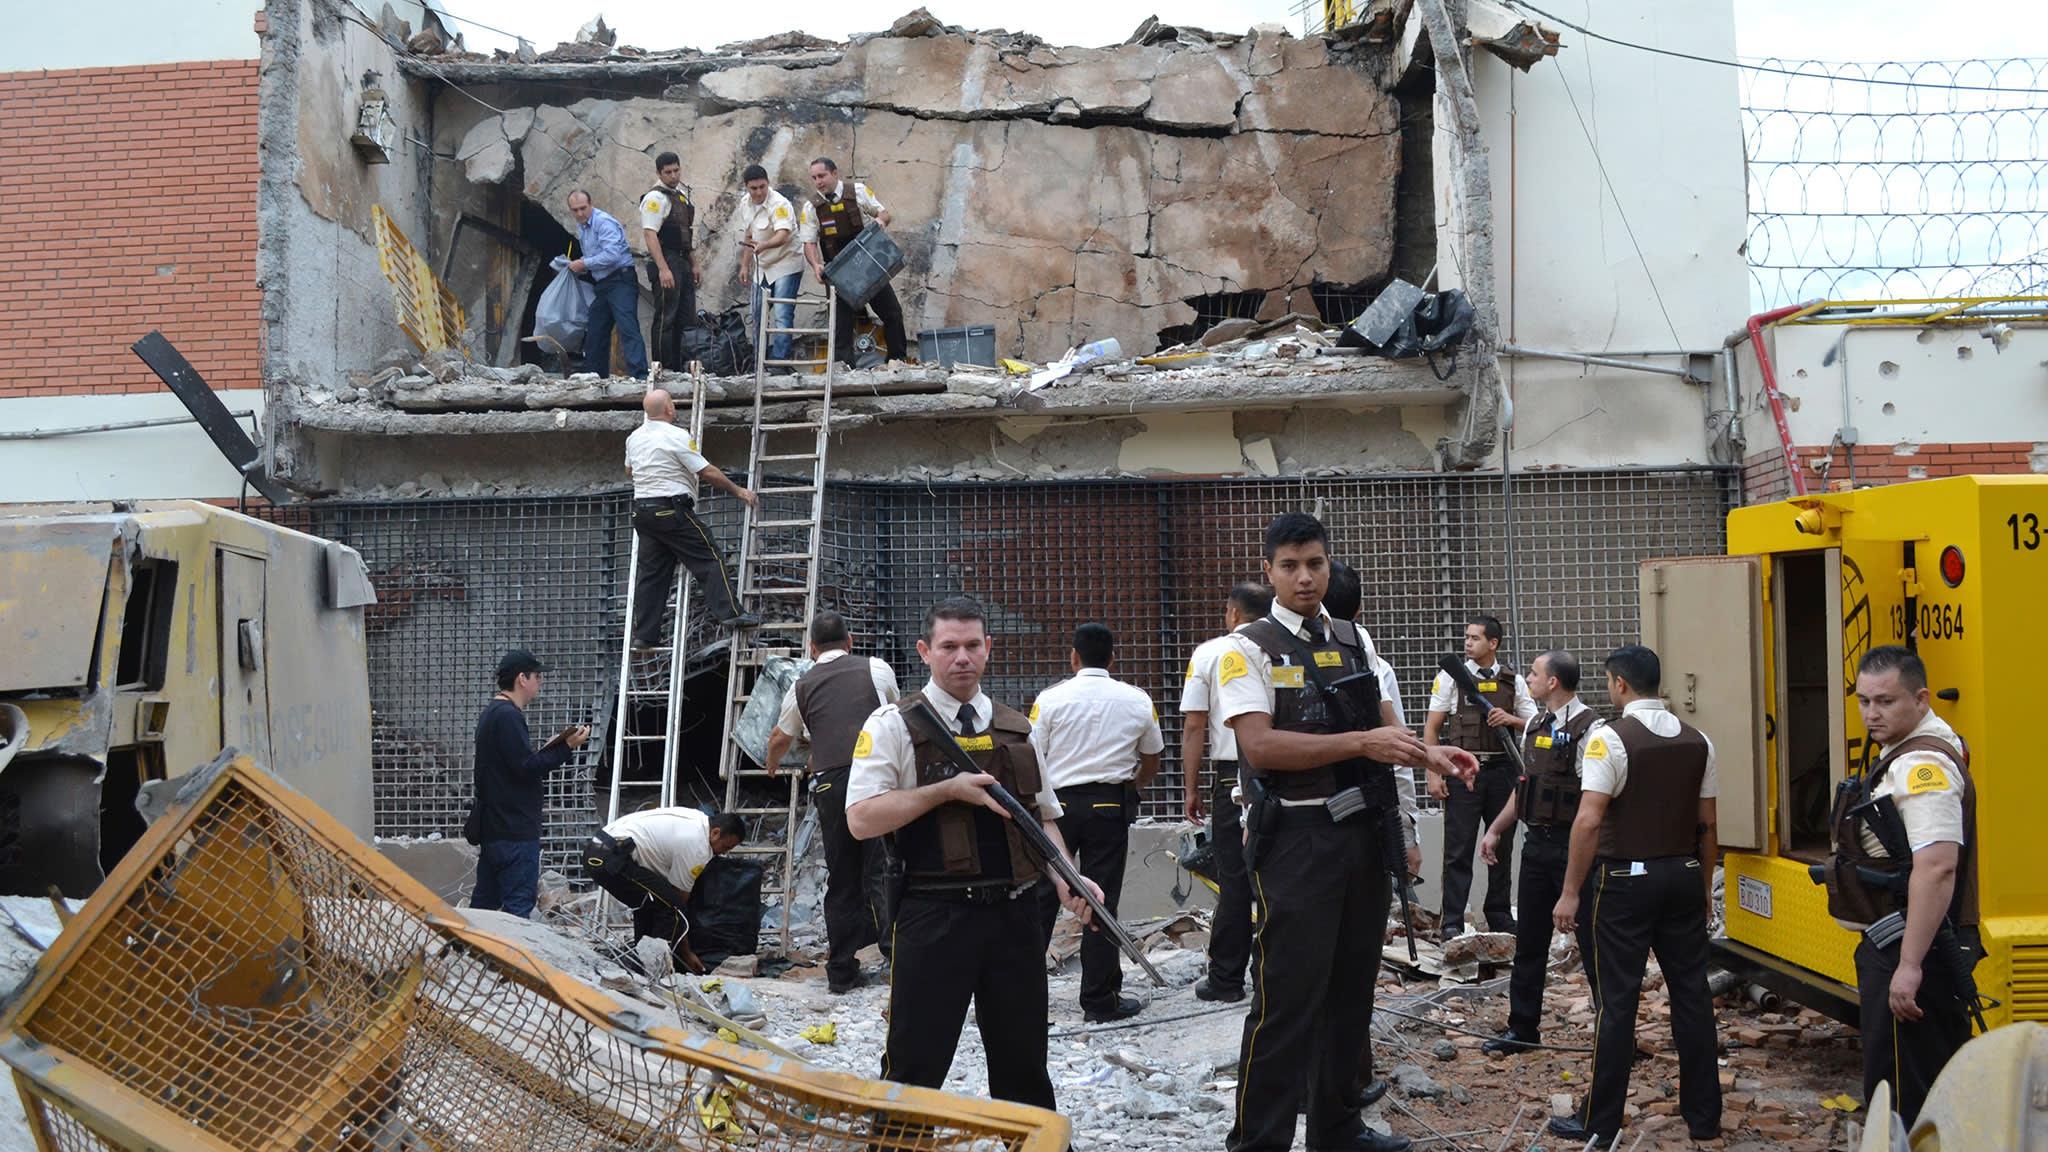 The scene of the security depot raid in Ciudad del Este, Paraguay, this April